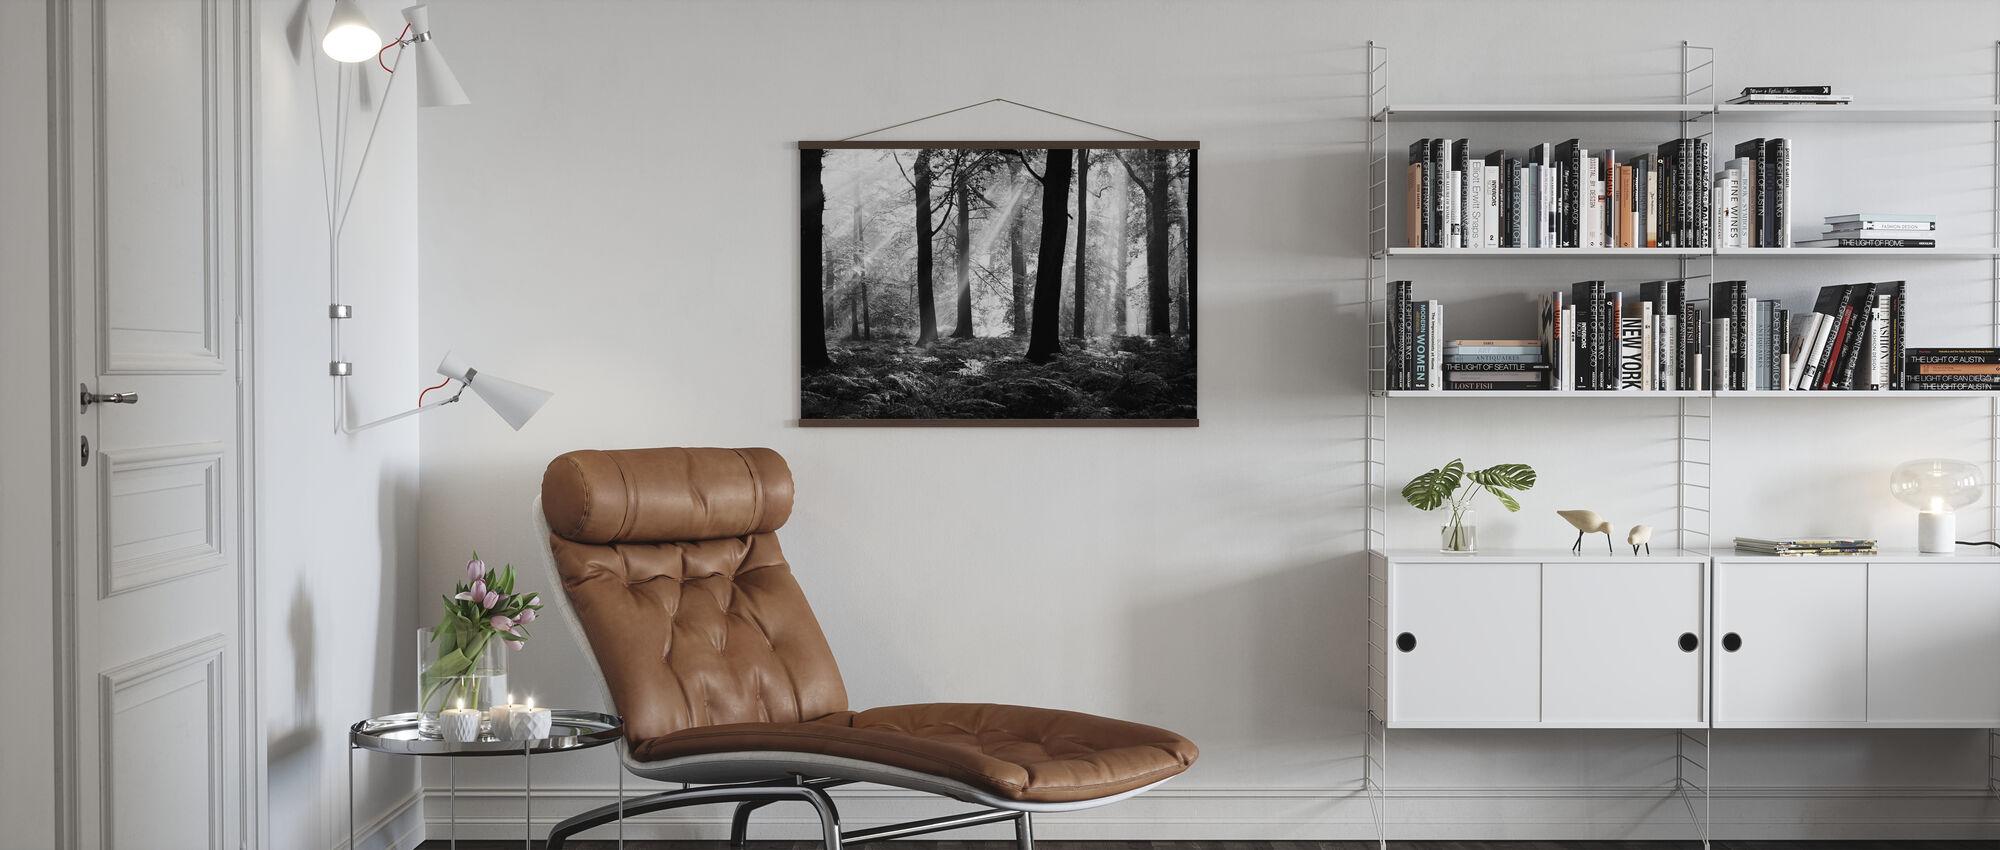 August Morning - b/w - Poster - Living Room